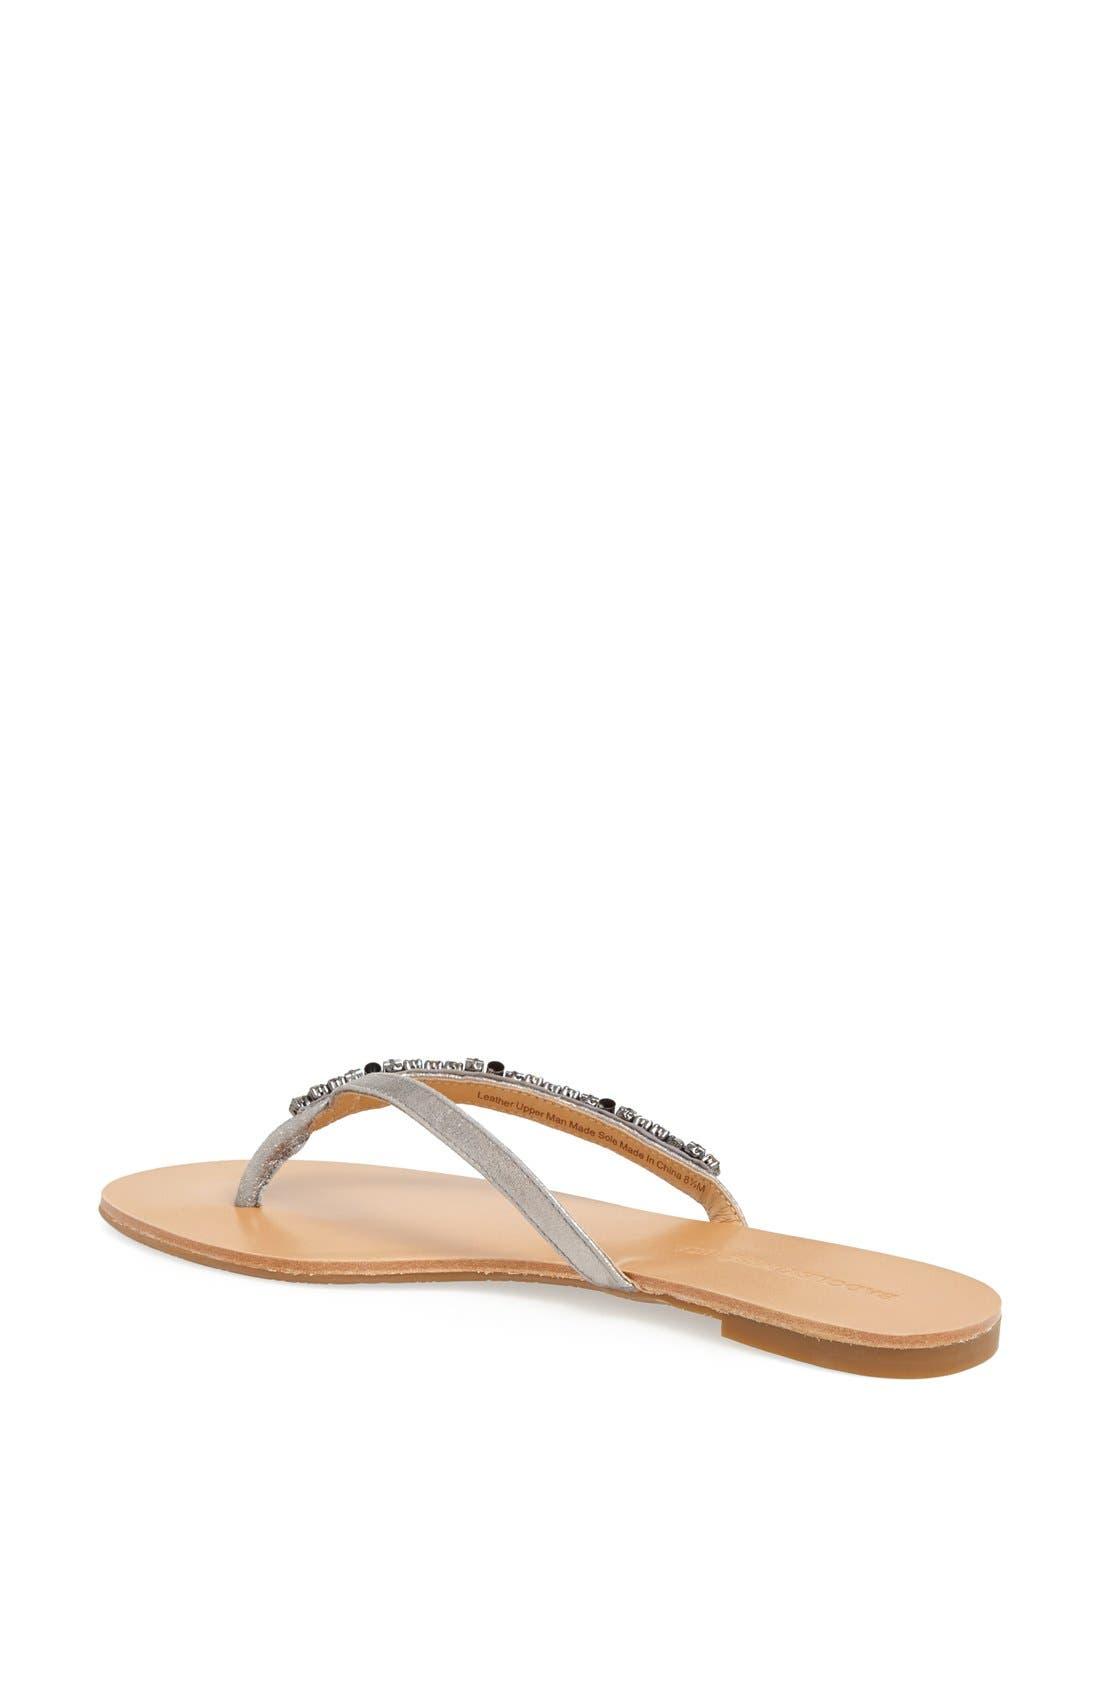 Alternate Image 2  - Badgley Mischka 'Kamryn' Thong Sandal